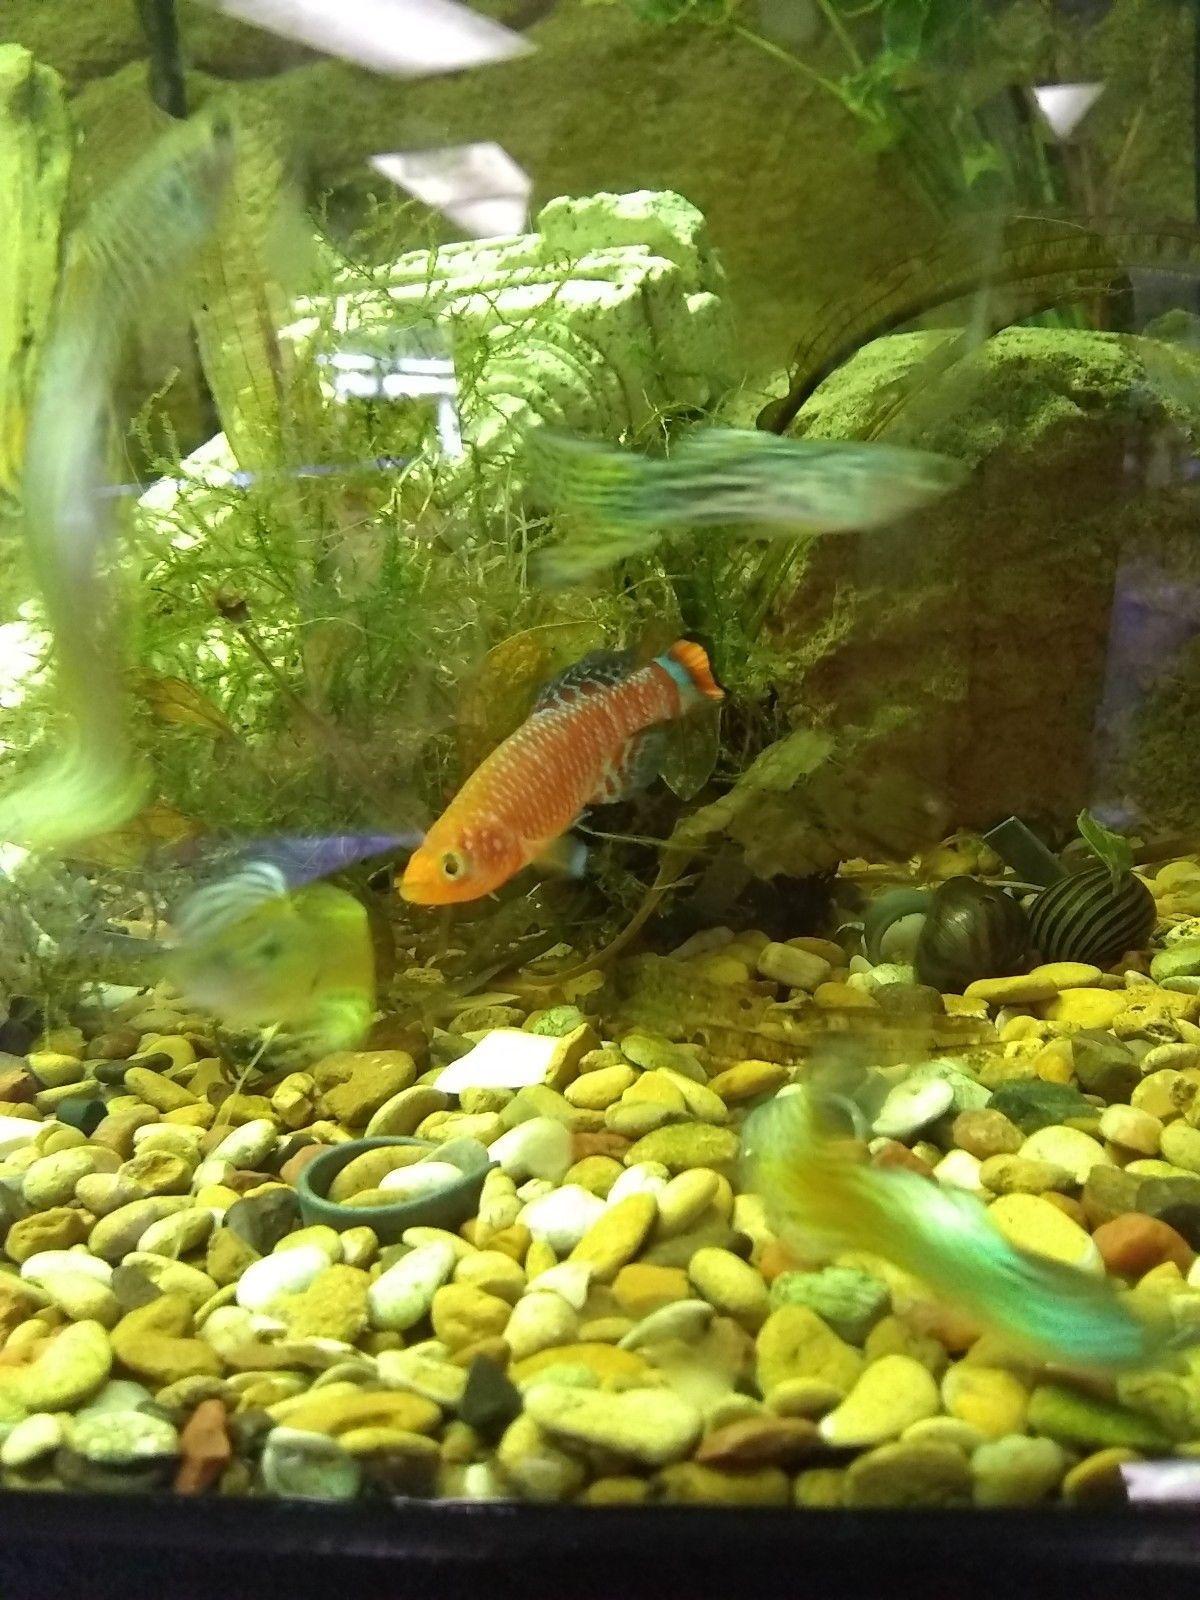 Nothobranchius Rachovii Killifish 1 1 5 Inch Live Fish For Sale Nothobranchius Rachovii Killifish 1 1 5 Tropical Fish Store Live Fish For Sale Fish